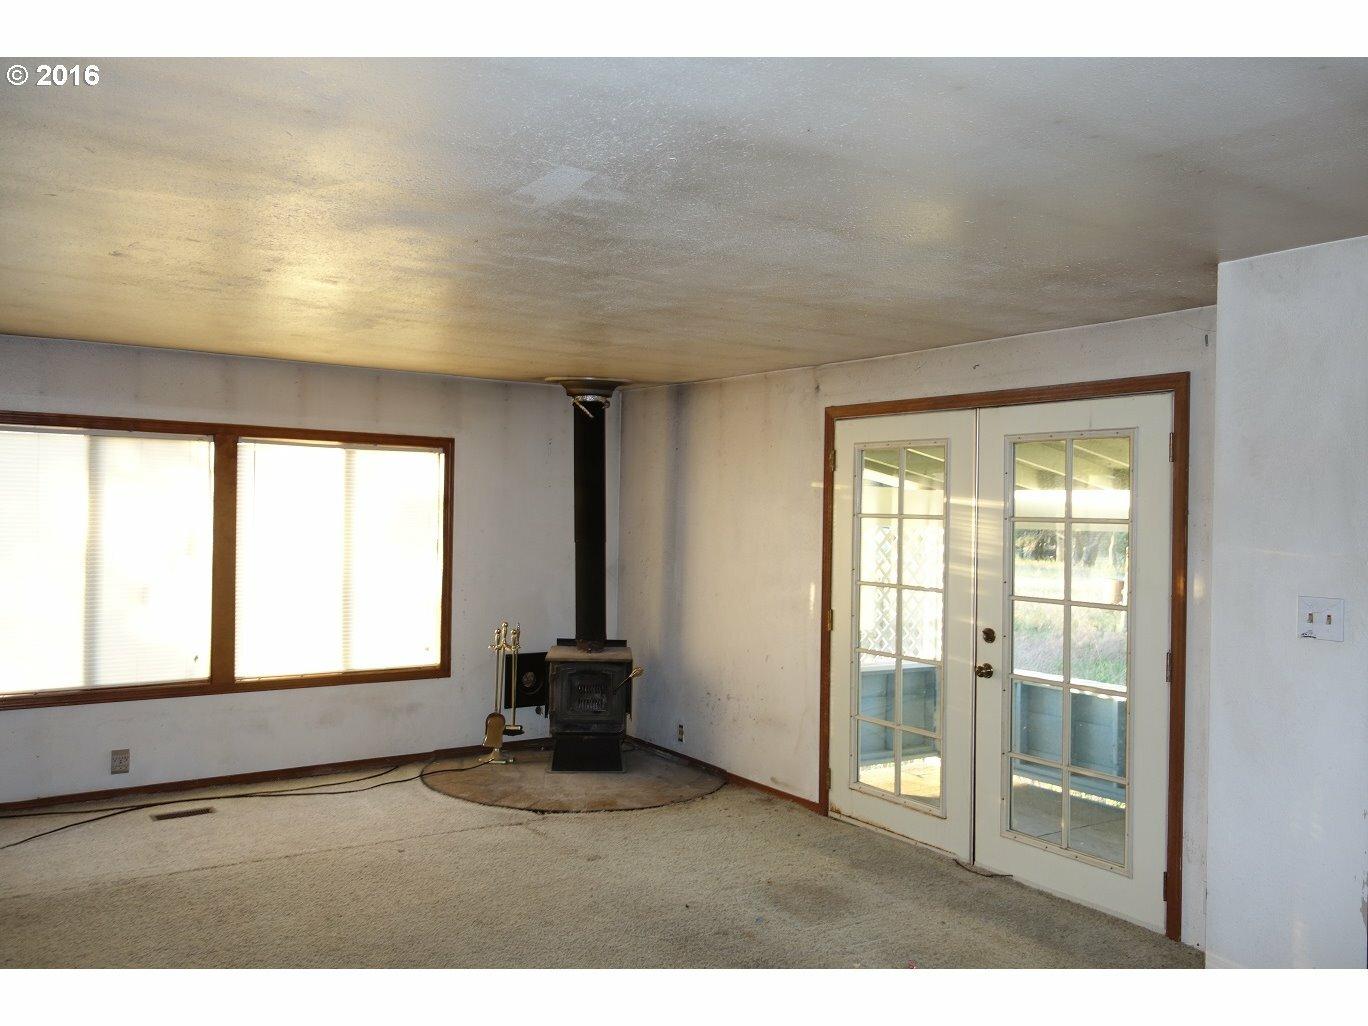 2282 Hwy 142, Goldendale, WA - USA (photo 5)